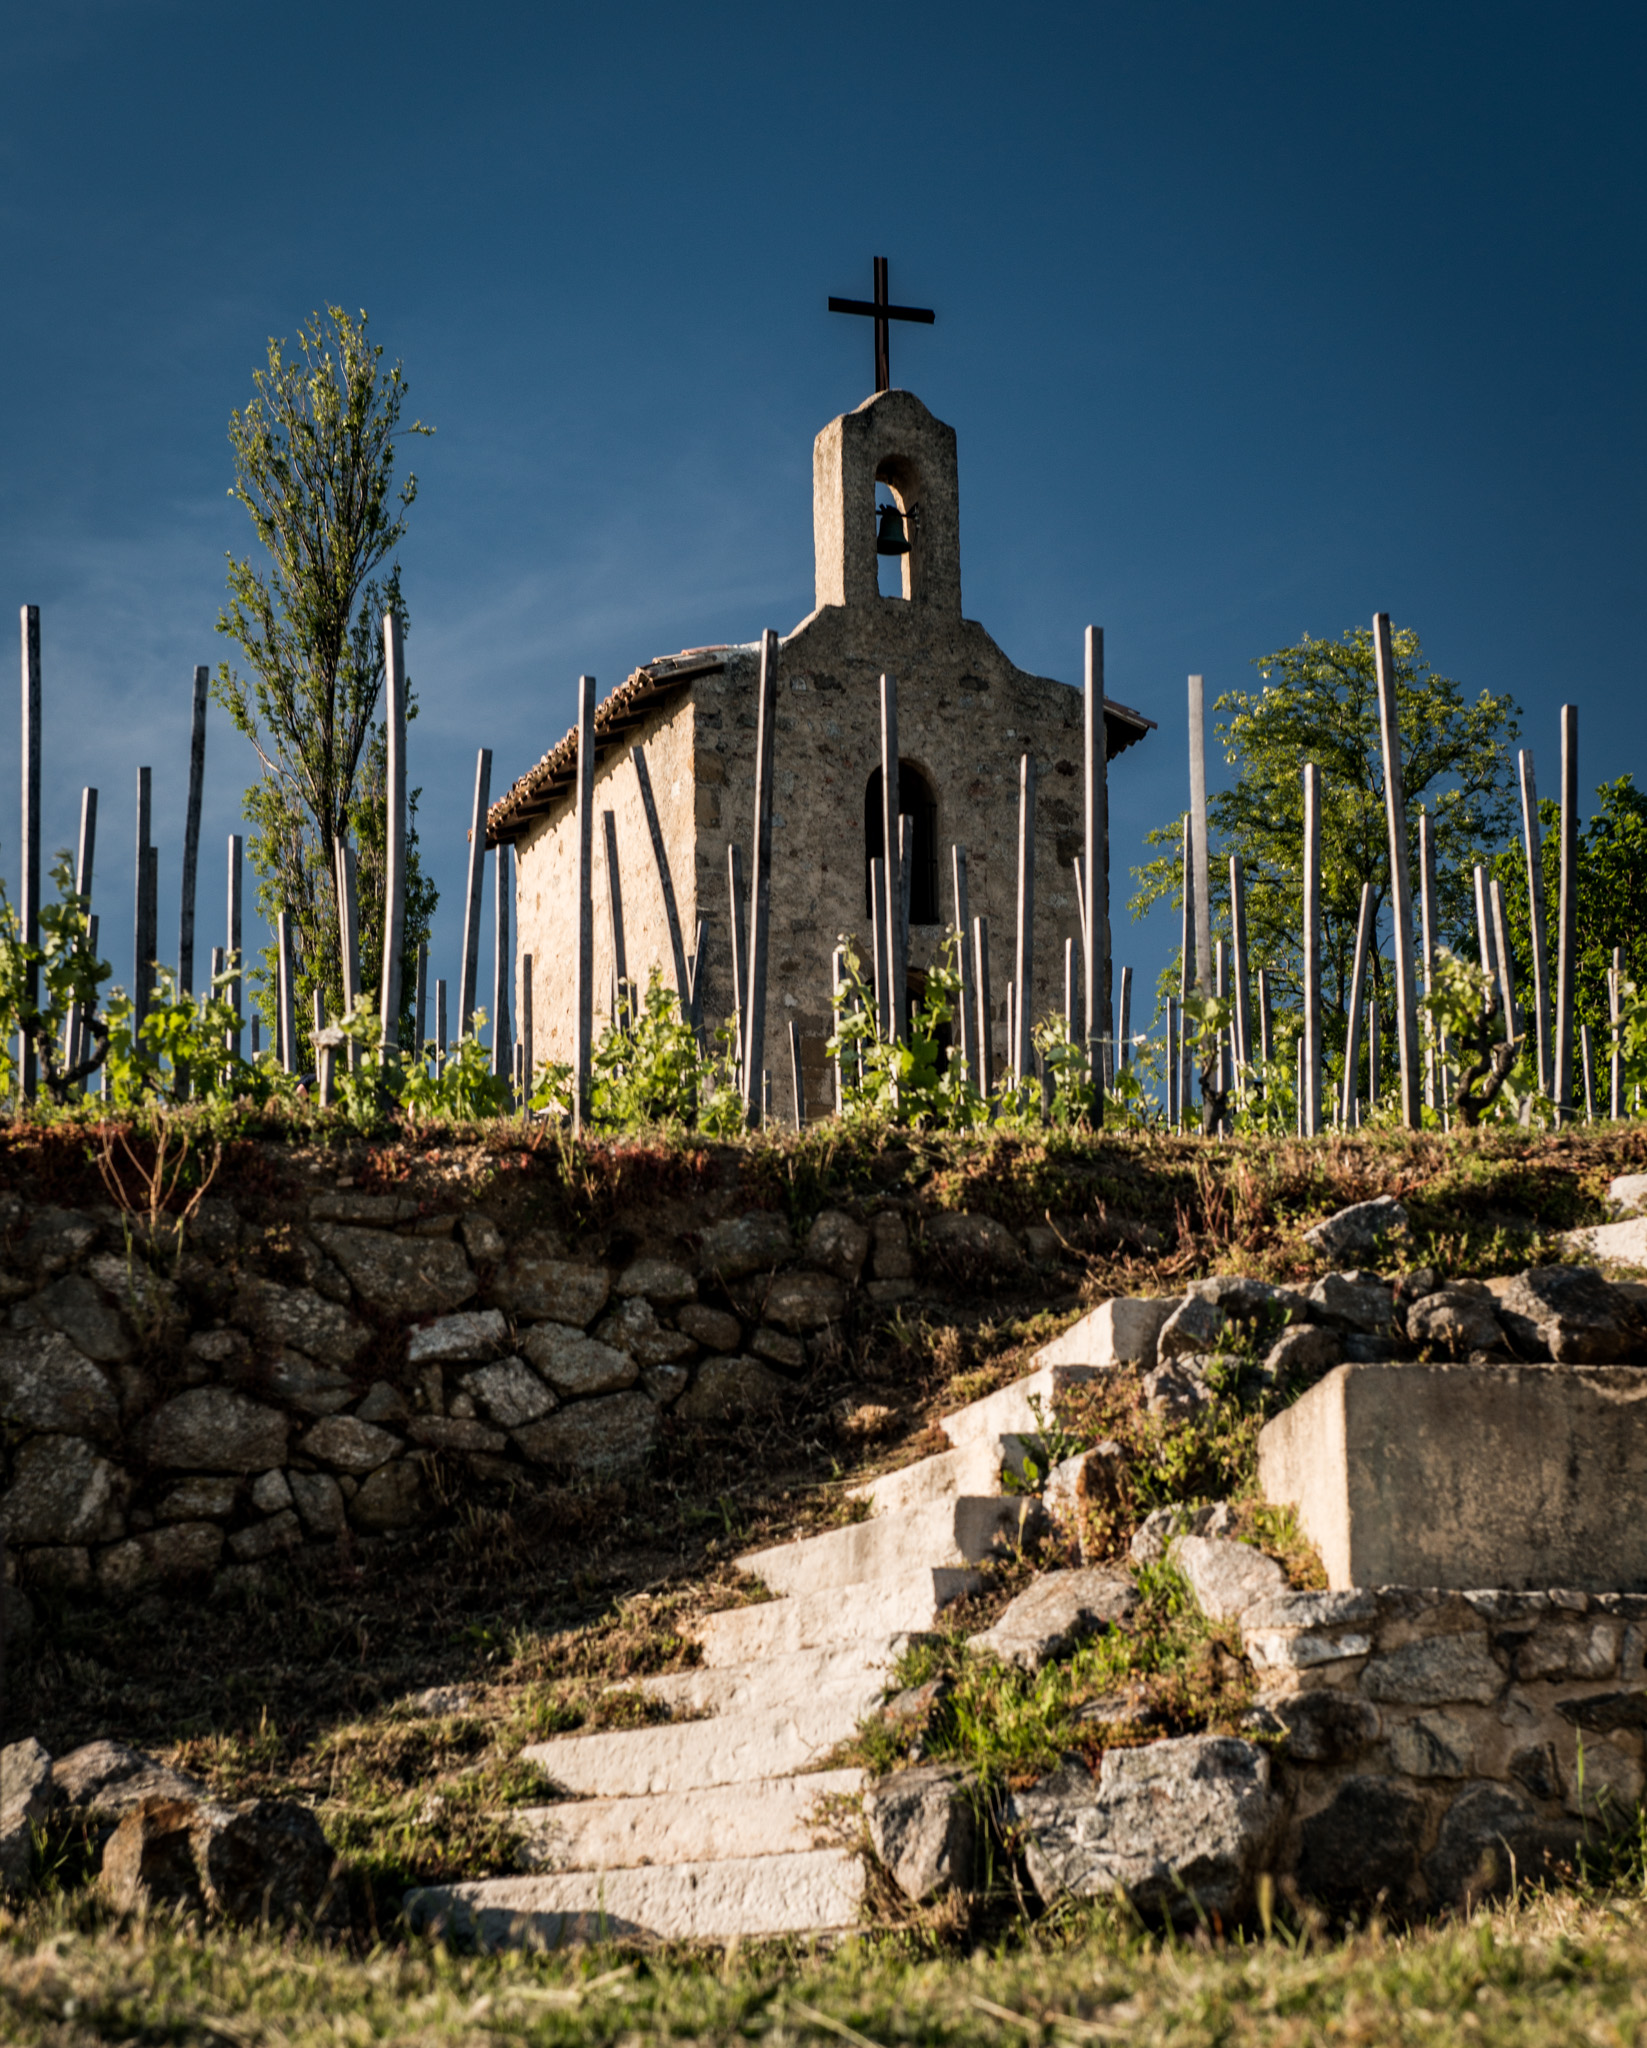 France : Northern Rhone : La Chapelle de l'Hermitage